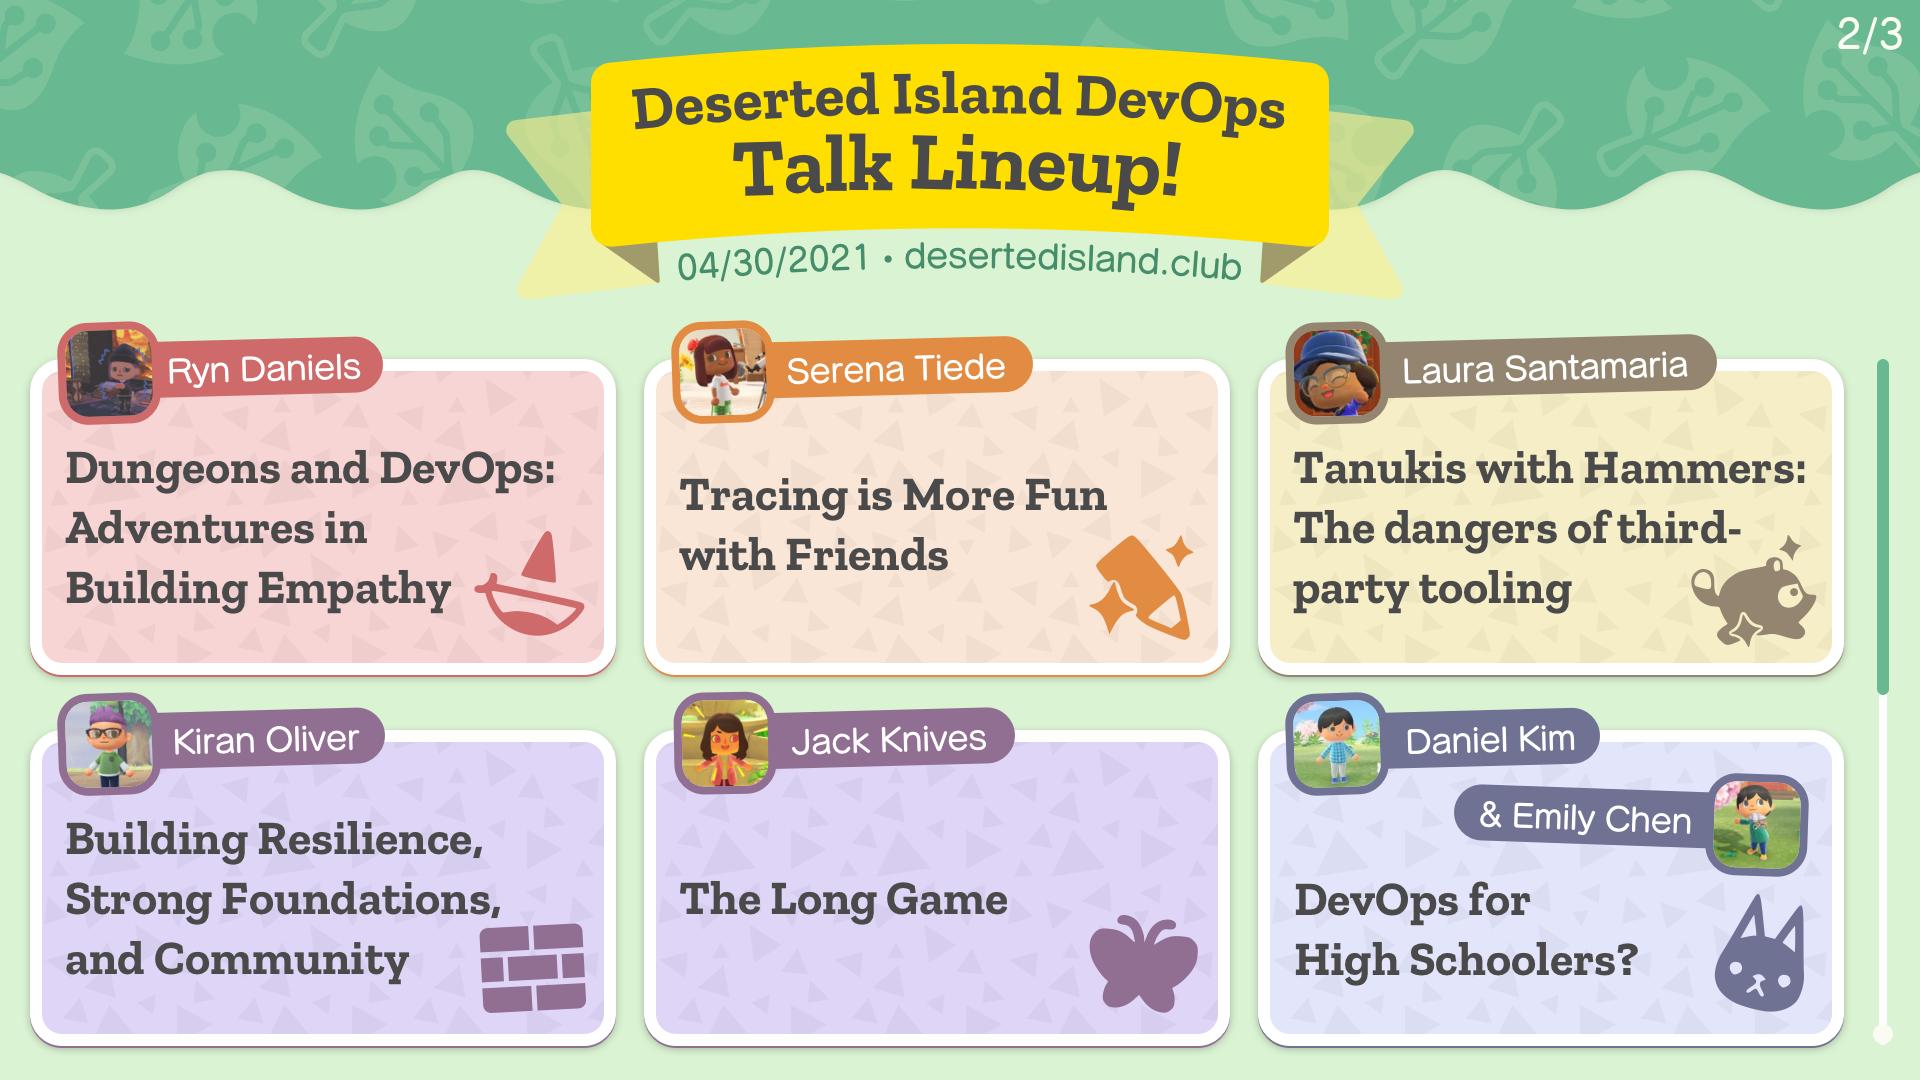 Deserted Island DevOps talk lineup!